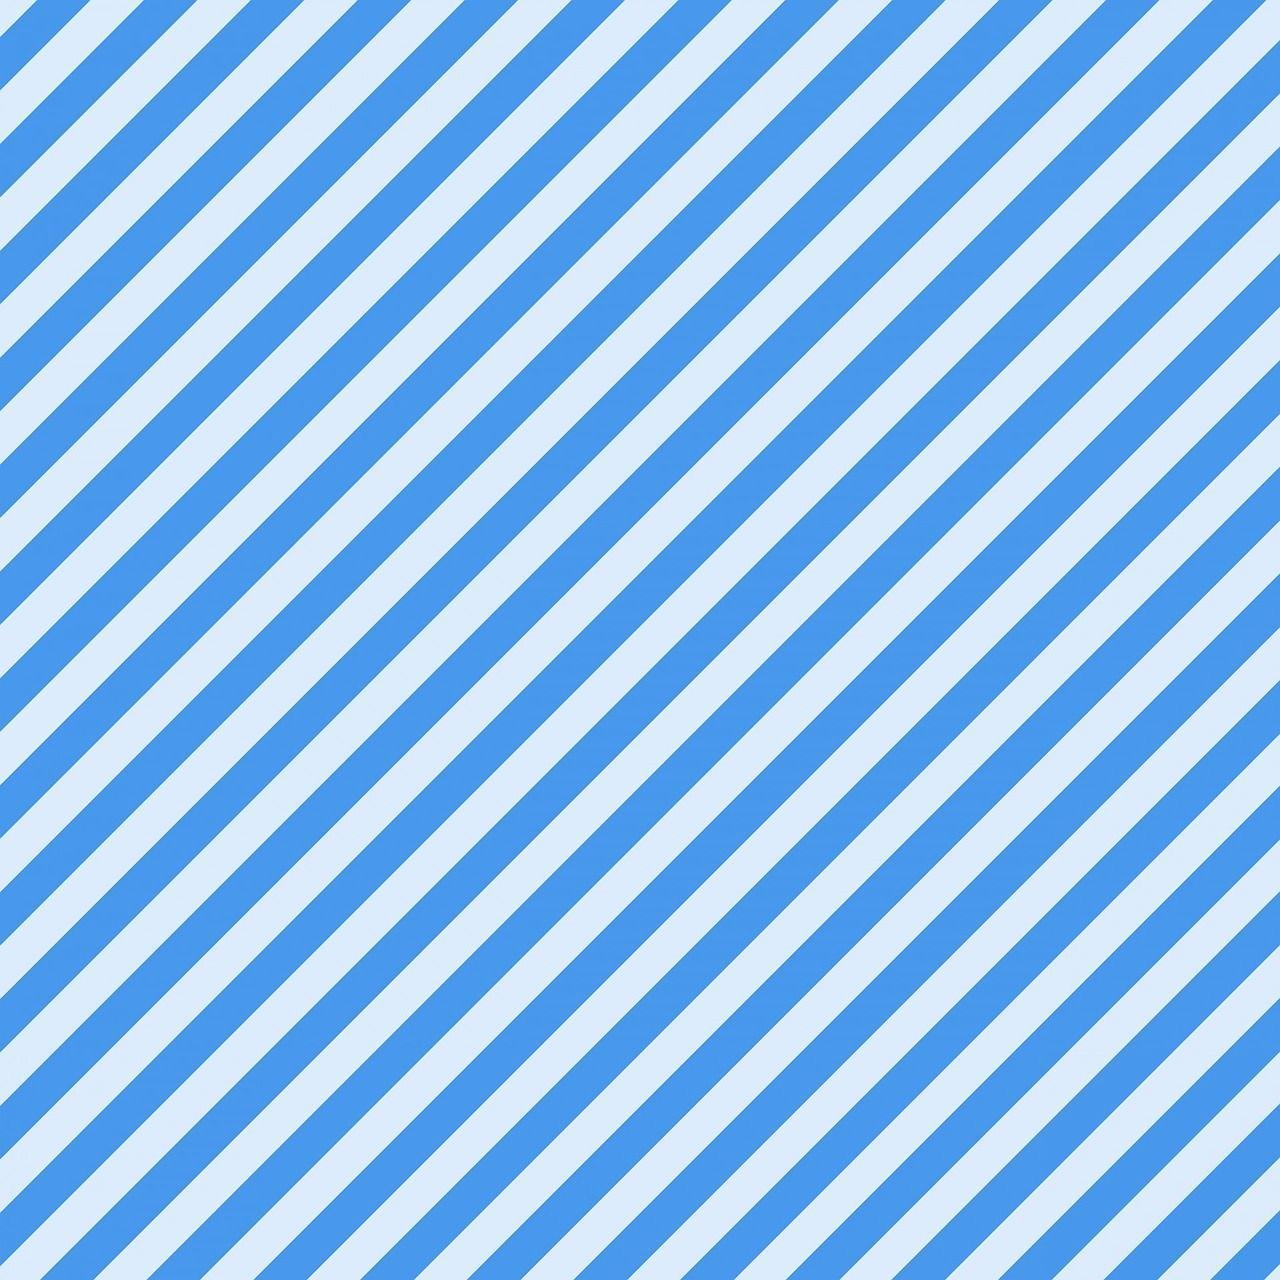 Diagonal Stripes Wallpapers - Top Free Diagonal Stripes Backgrounds -  WallpaperAccess